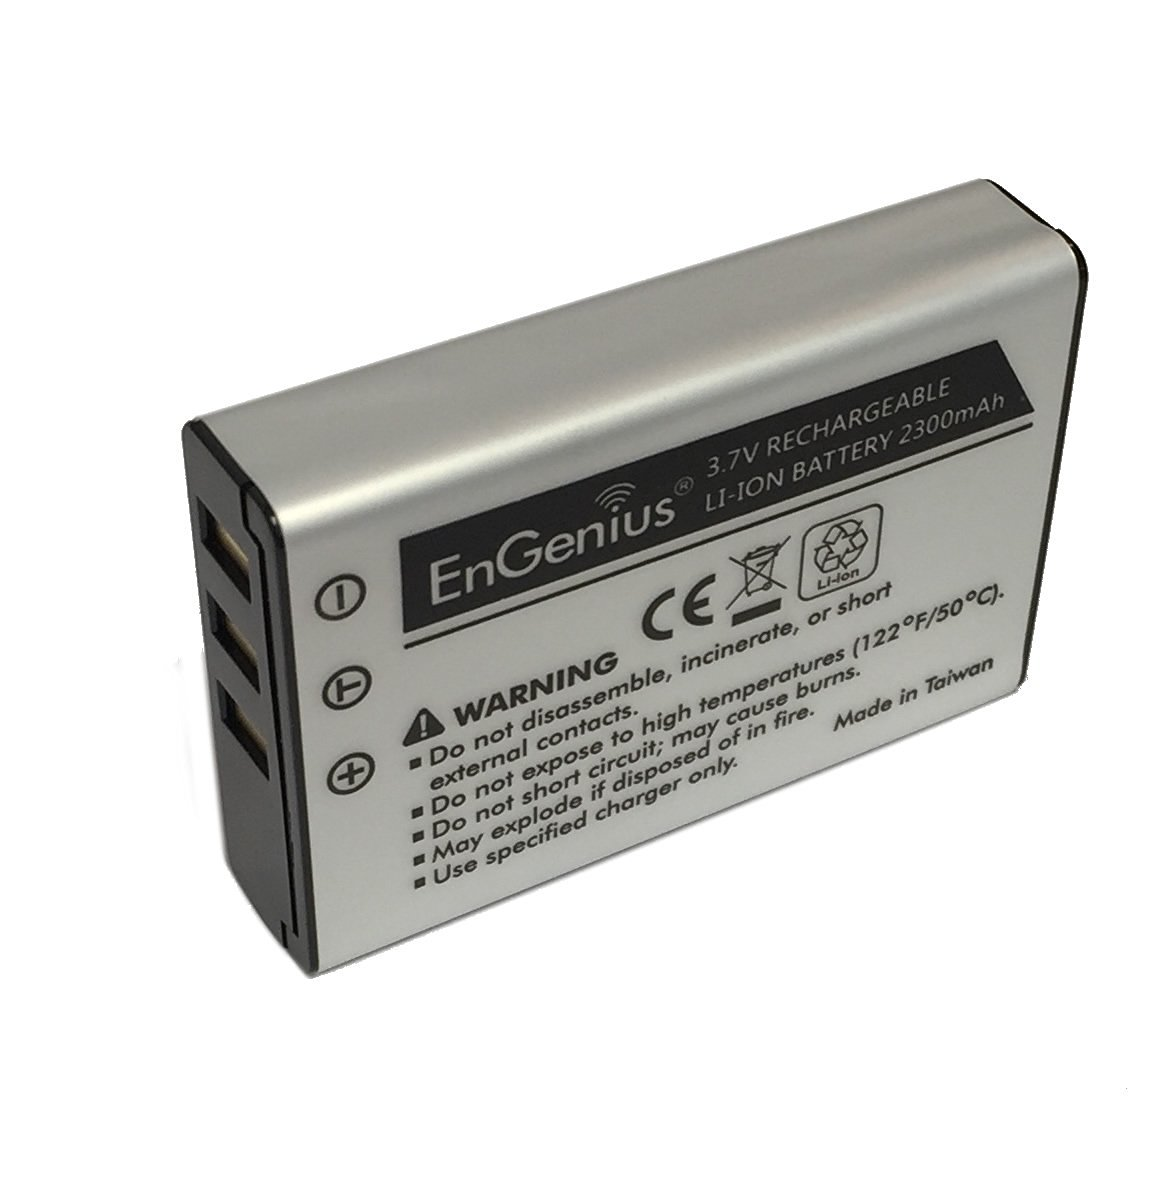 Engenius Technologies DuraFon-UHF-BA Durafon-uhf Handset Battery Pack